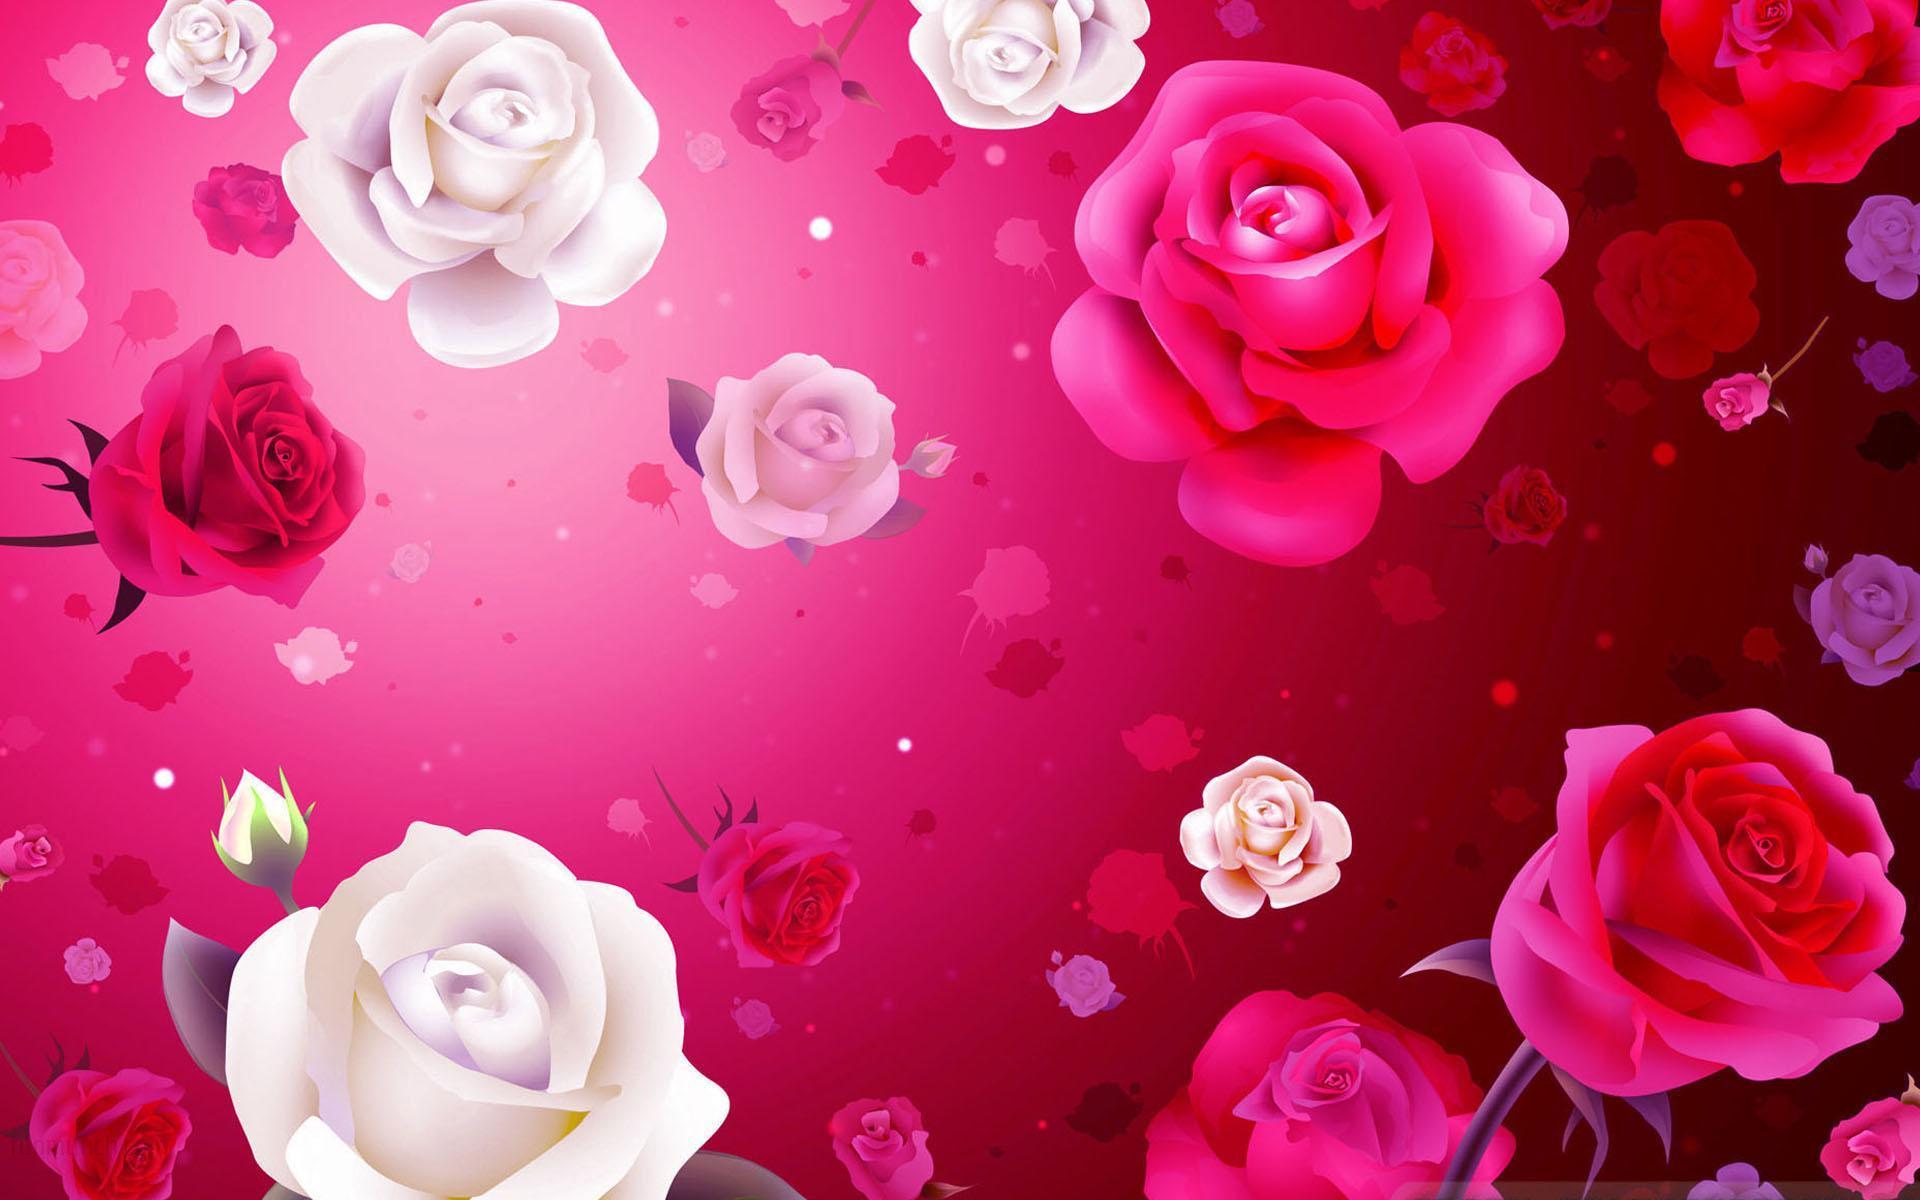 Valentines Day Desktop Wallpaper 8518 Hd Wallpapers in Celebrations 1920x1200